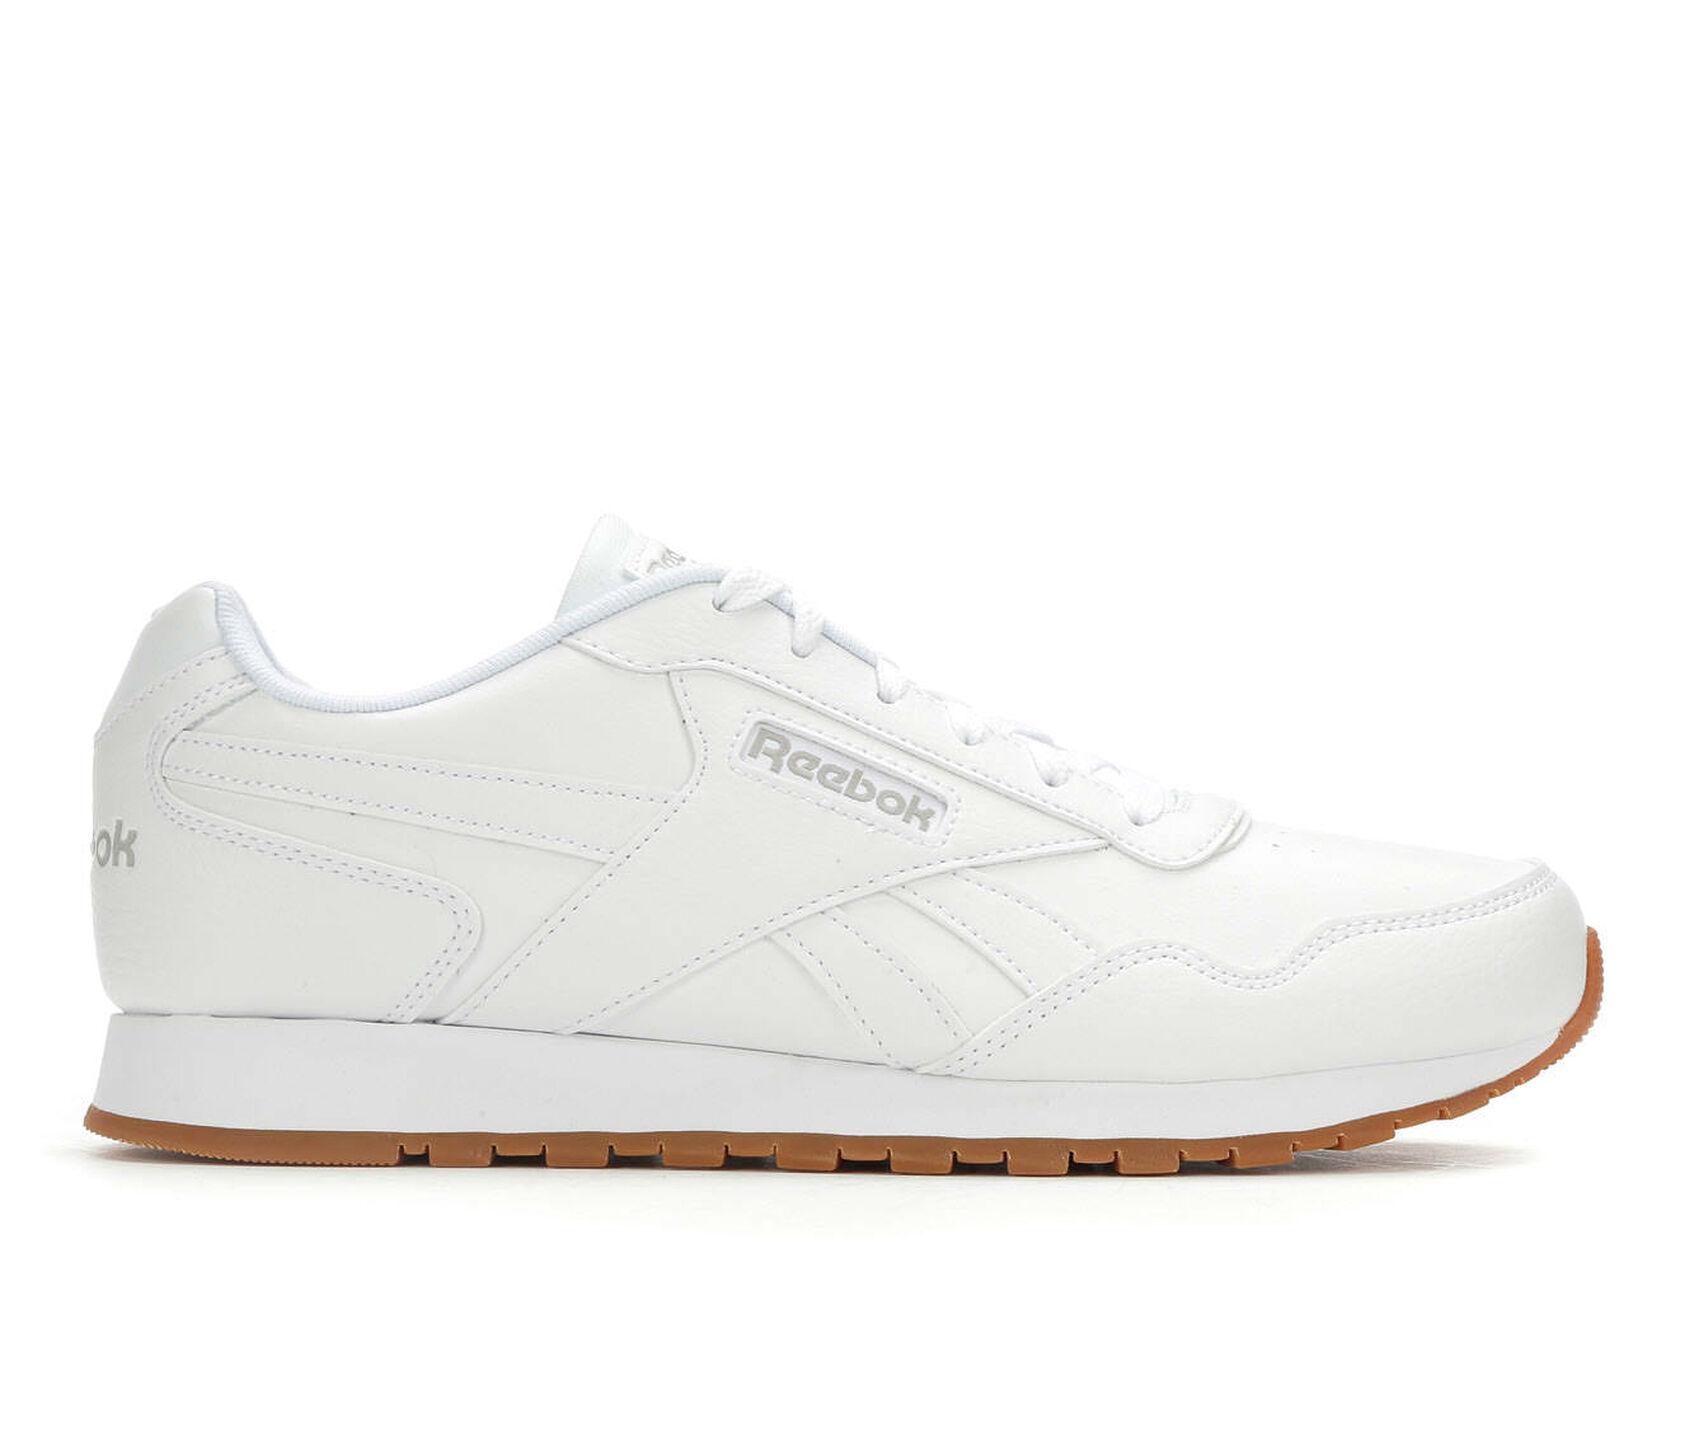 41f13cf859 Men's Reebok Harman Retro Sneakers